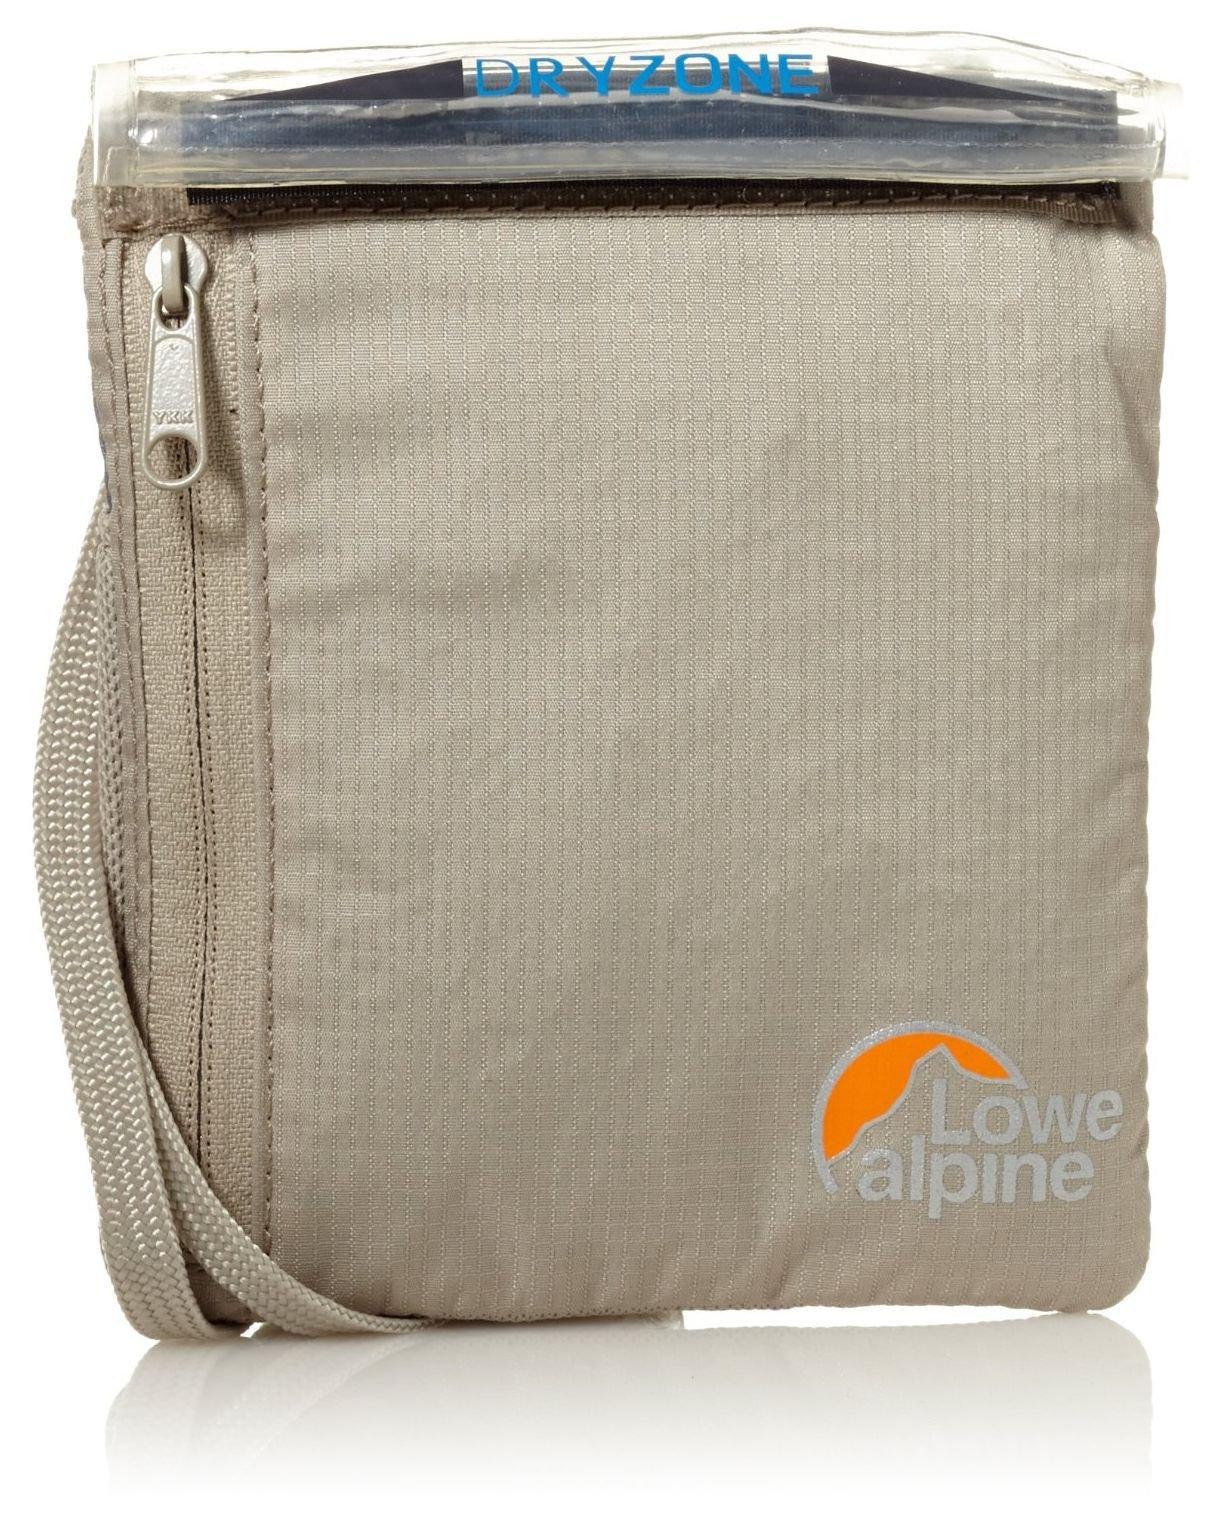 Lowe Alpine Dryzone Passport Wallet - Beige